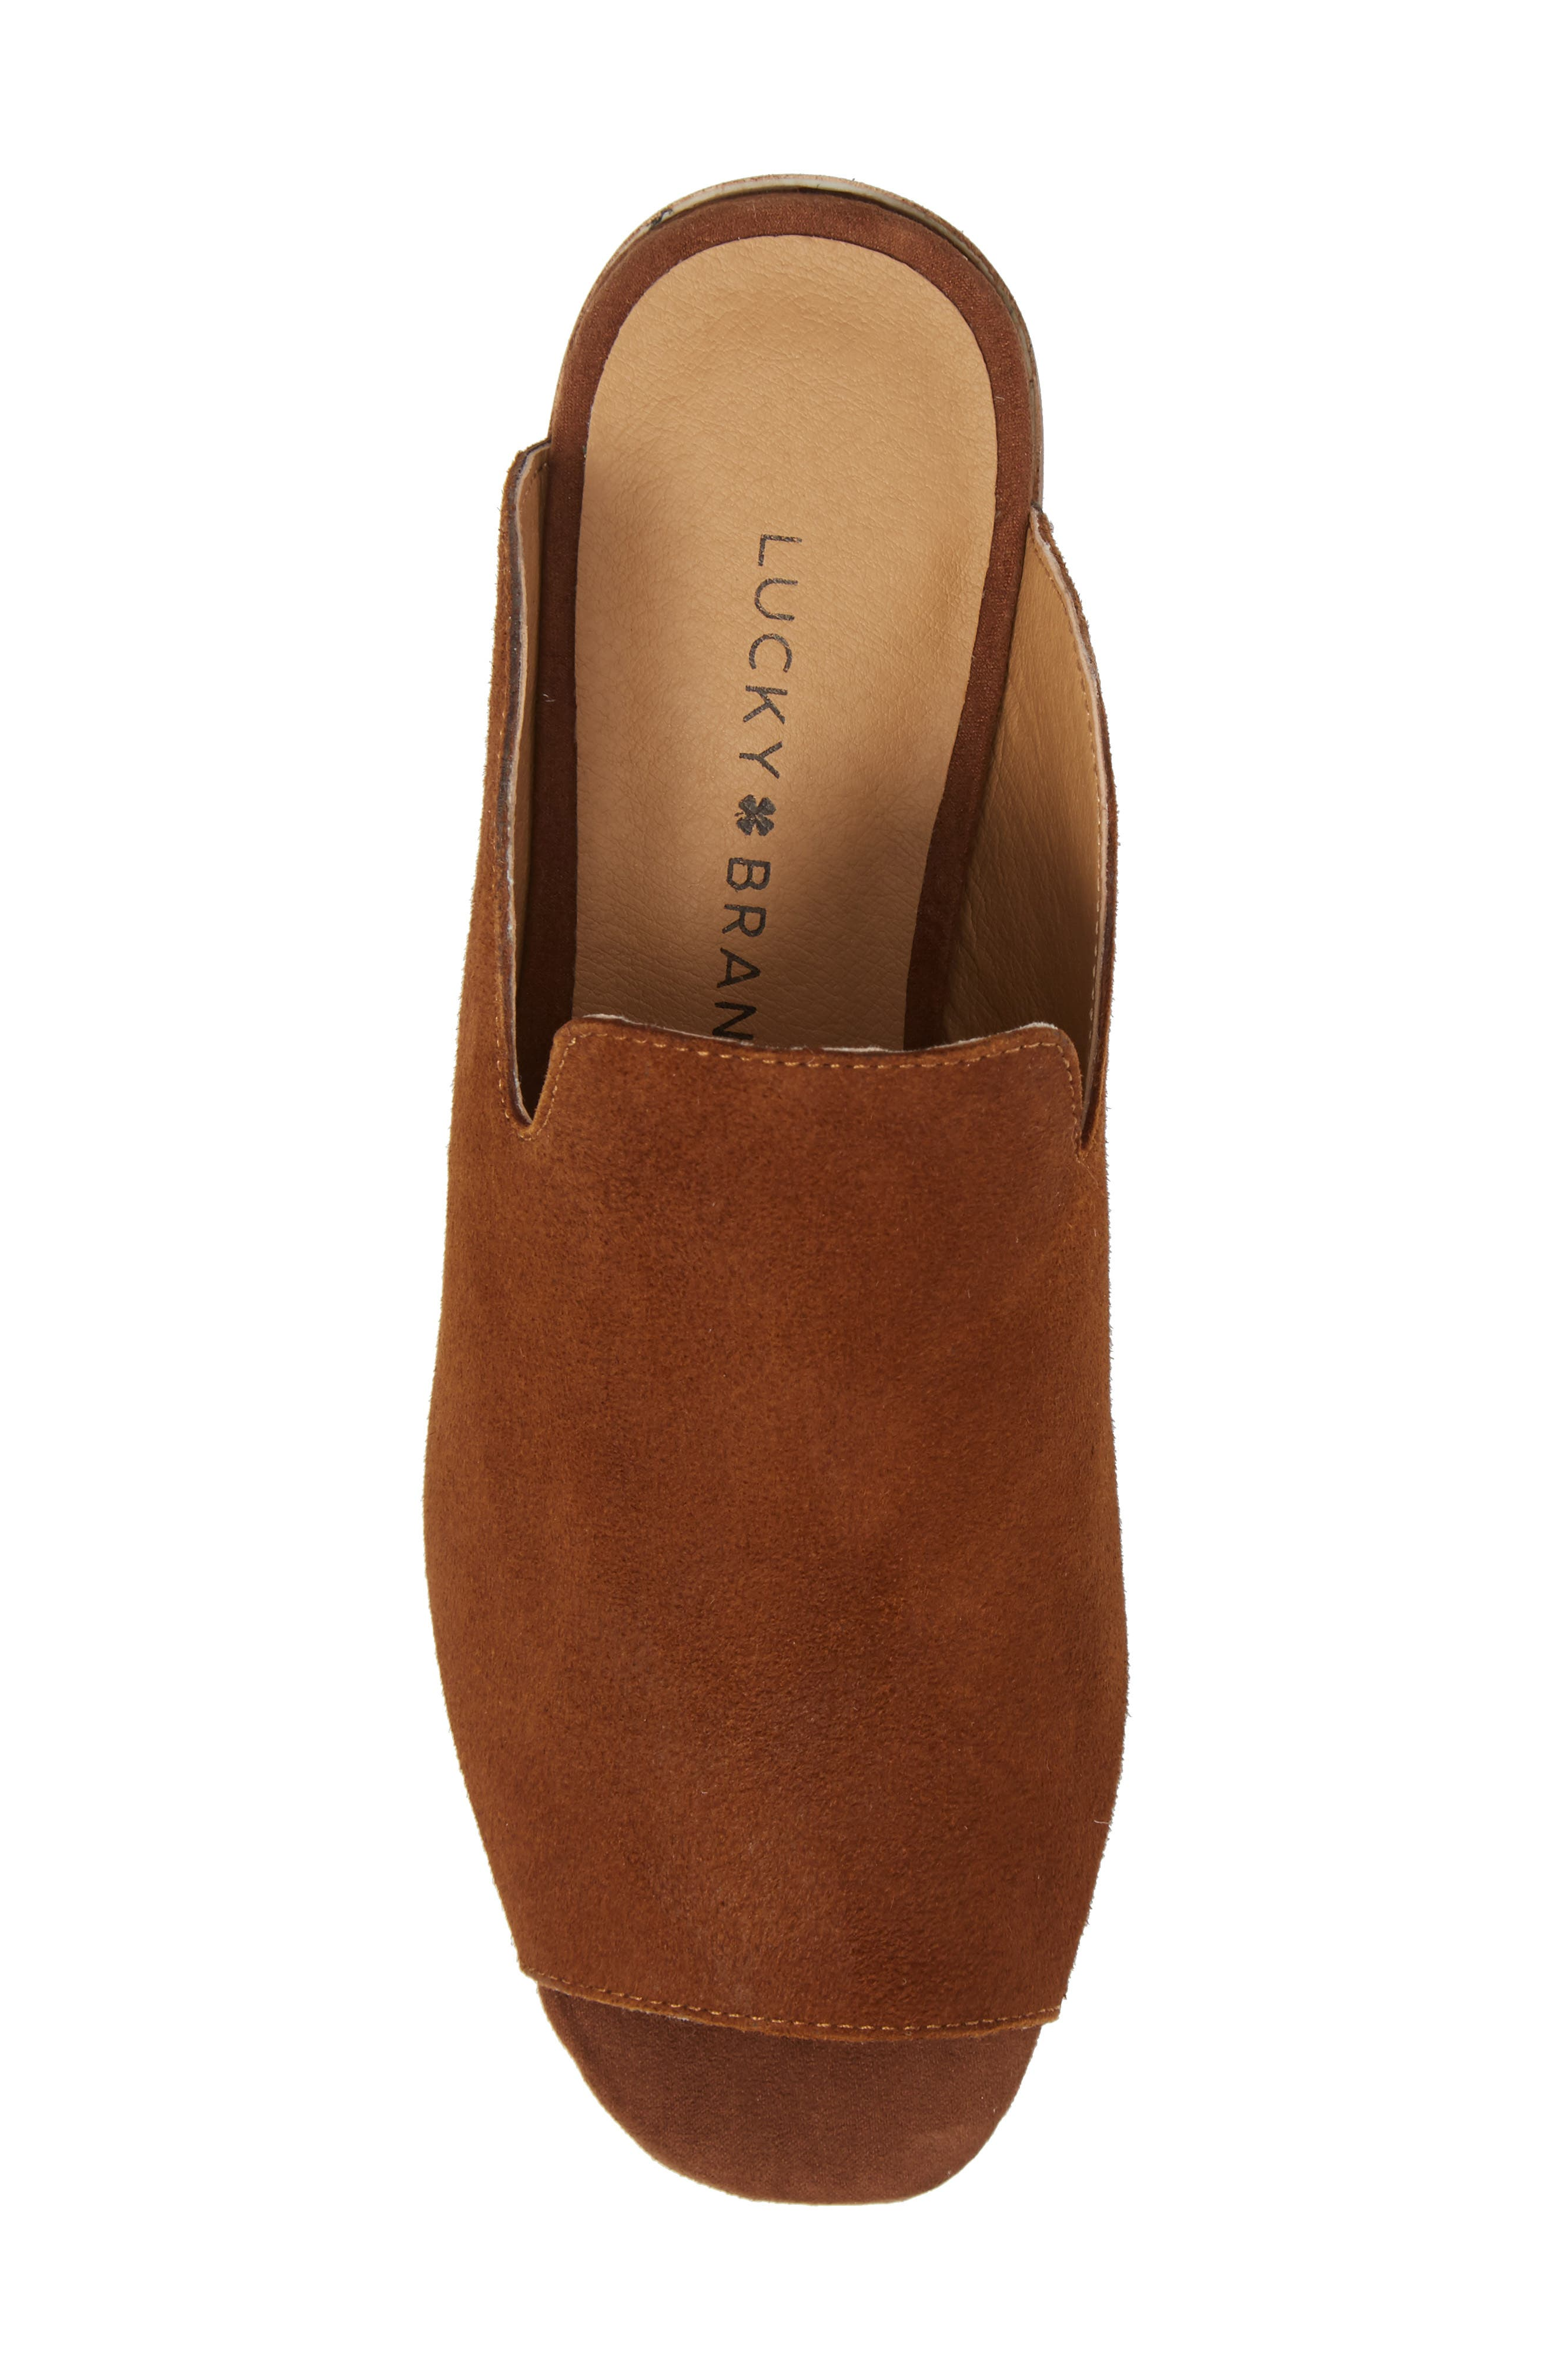 Noomrie Sandal,                             Alternate thumbnail 5, color,                             Cedar Leather